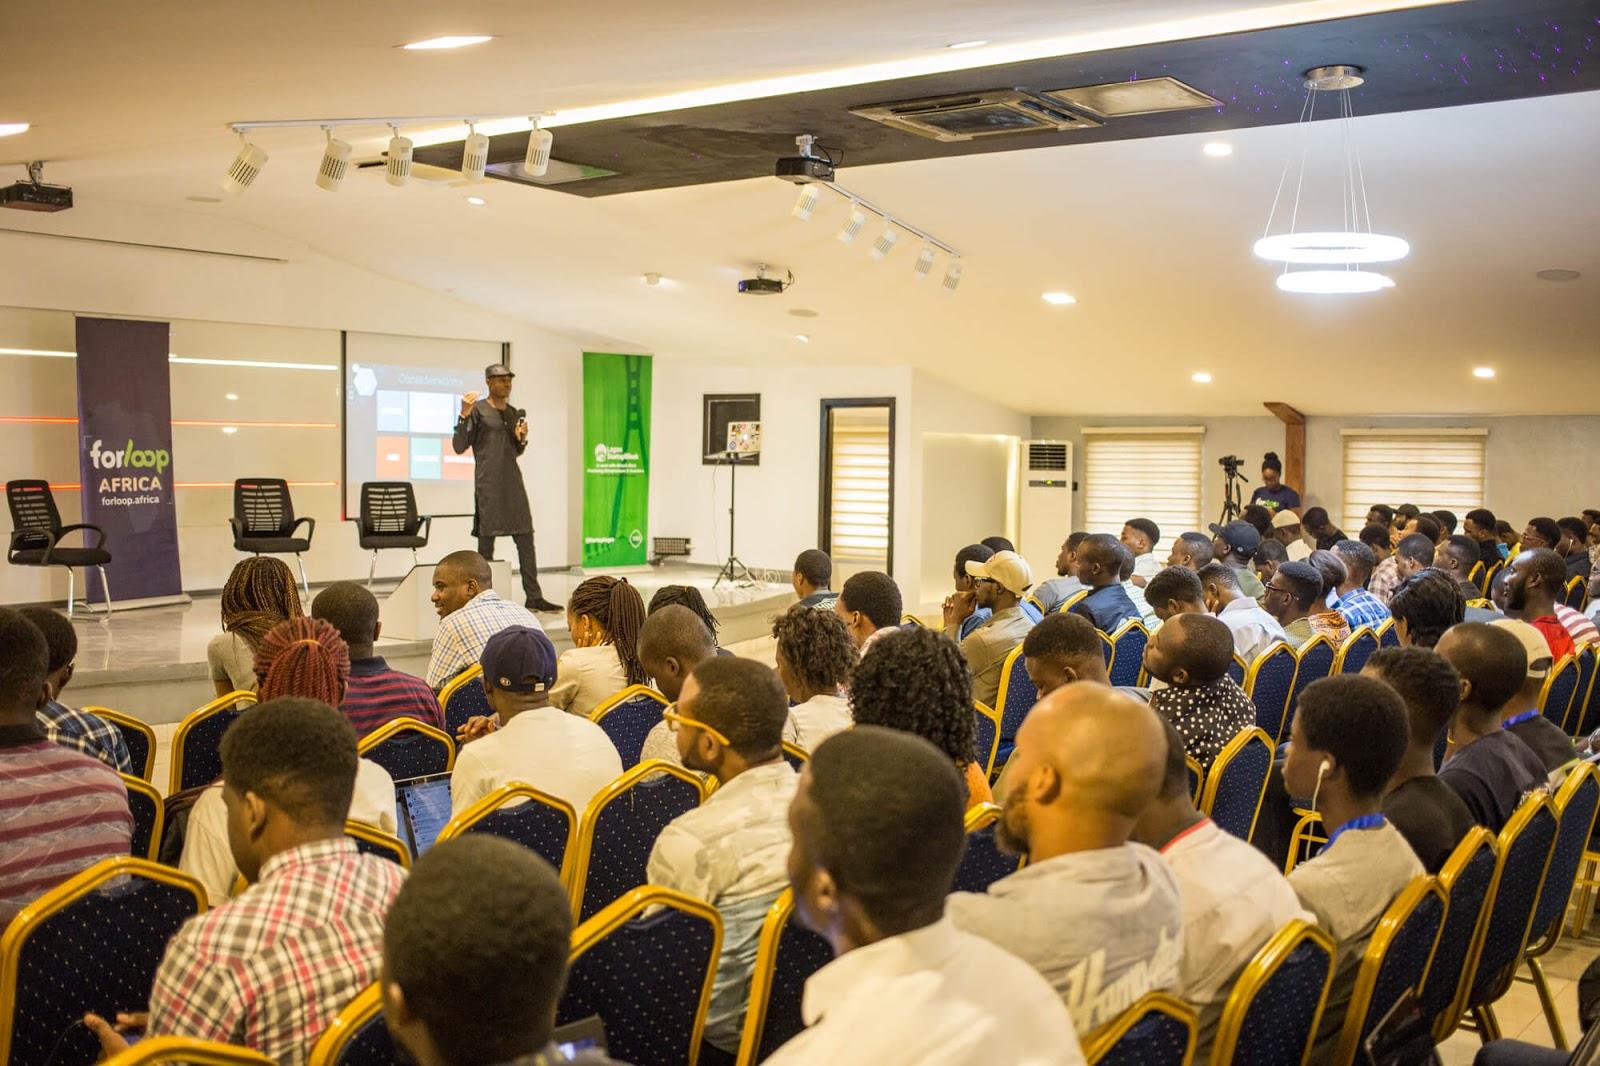 ForLoop Africa Board Member Chris Nwamba at a ForLoop Africa event. (Photo: Benjamin Dada)